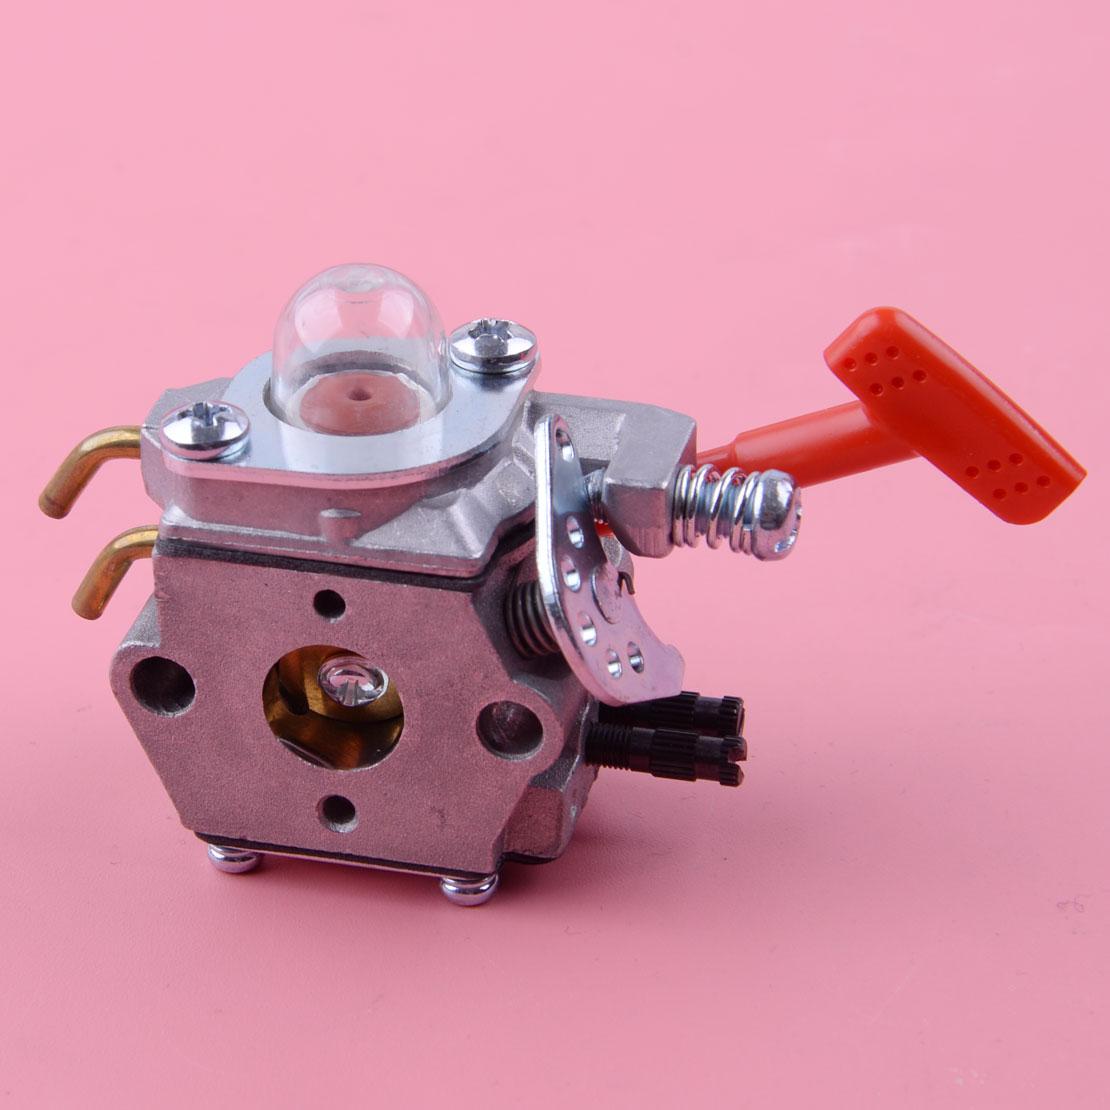 LETAOSK Durable Carburetor A04445A A03003 A07139 Fit For Zama C1U-H31C Walbro WT-191 WT-363 Homelite Ultra 25cc Trimmer